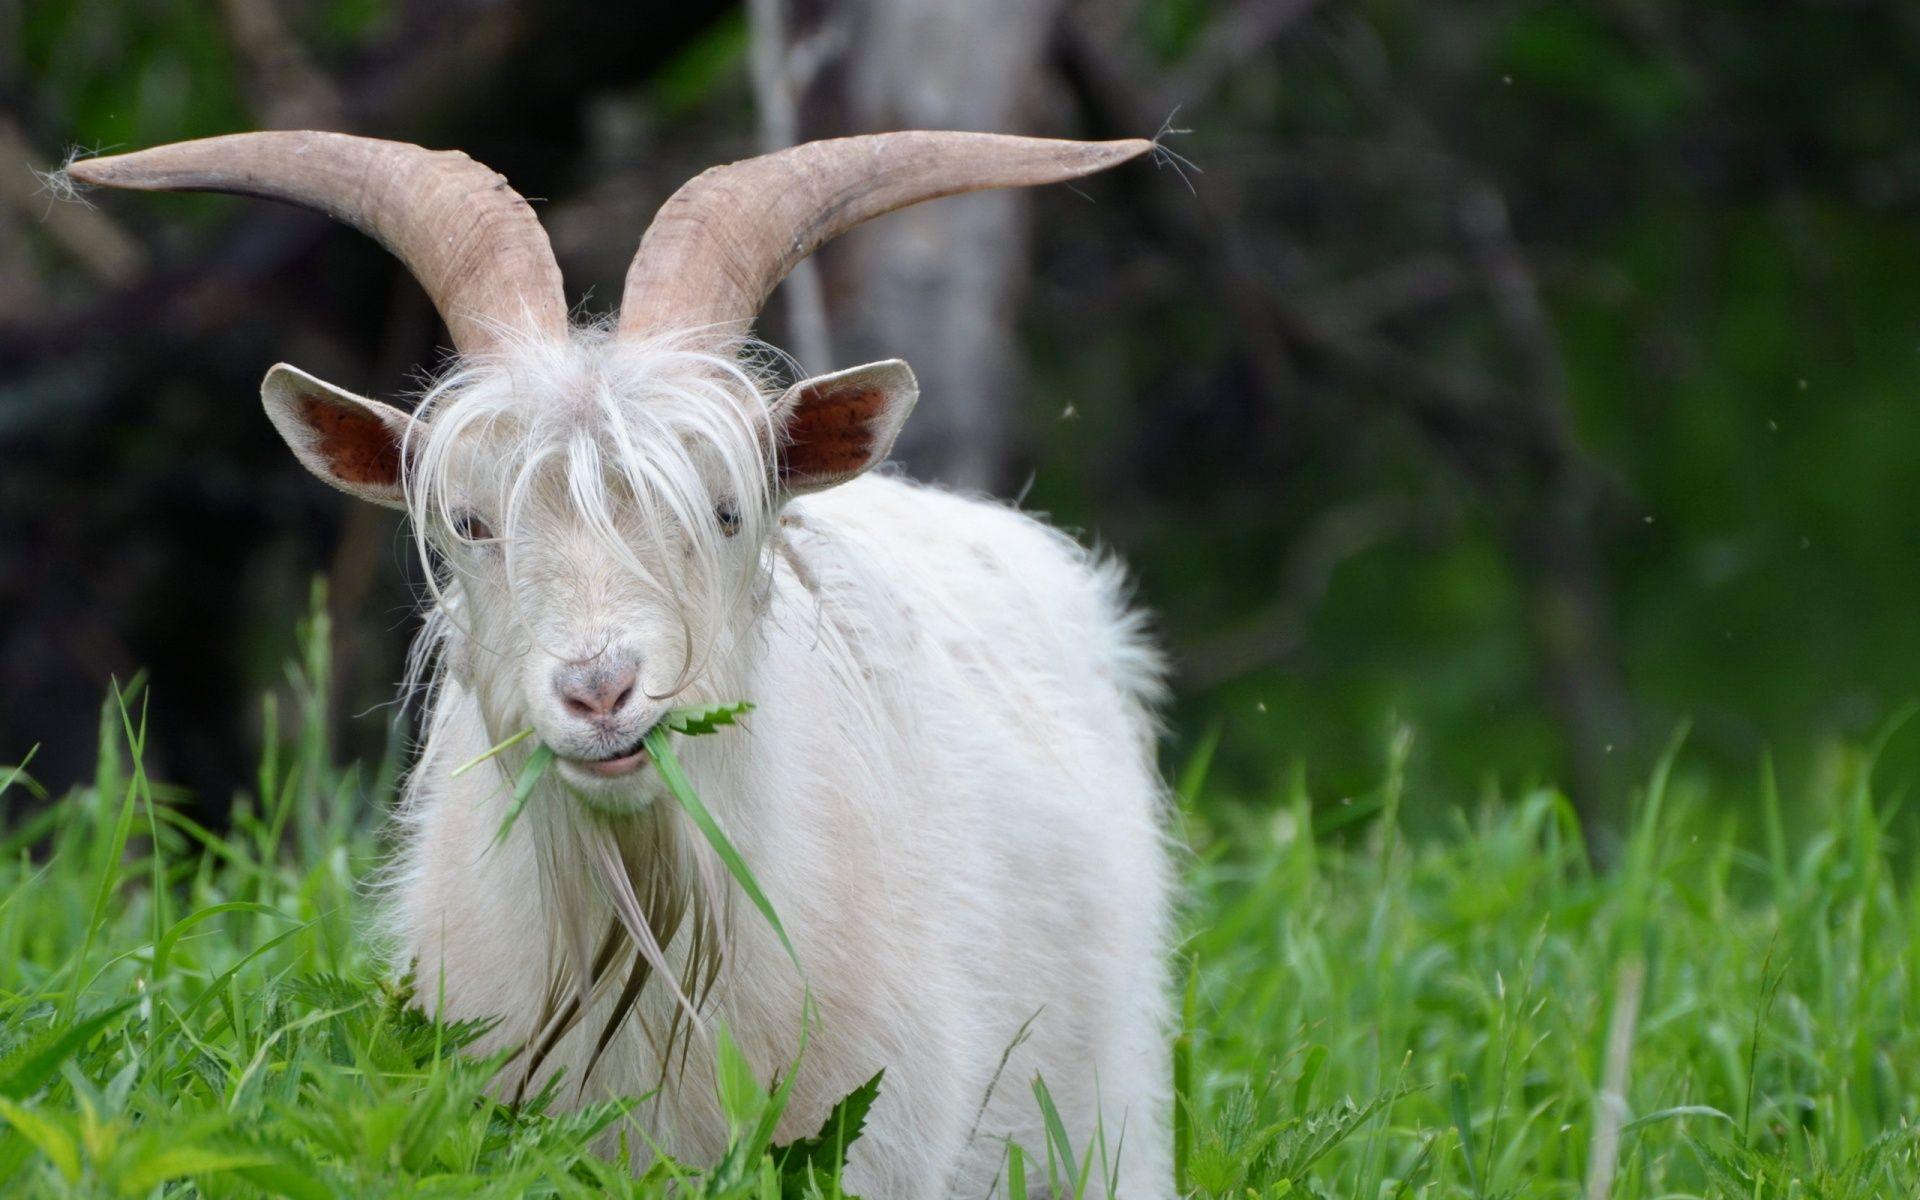 Download Wallpapers Download 2790x2547 Animals Grass: Goat Eating Fresh Grass Desktop Background HD 2560x1600